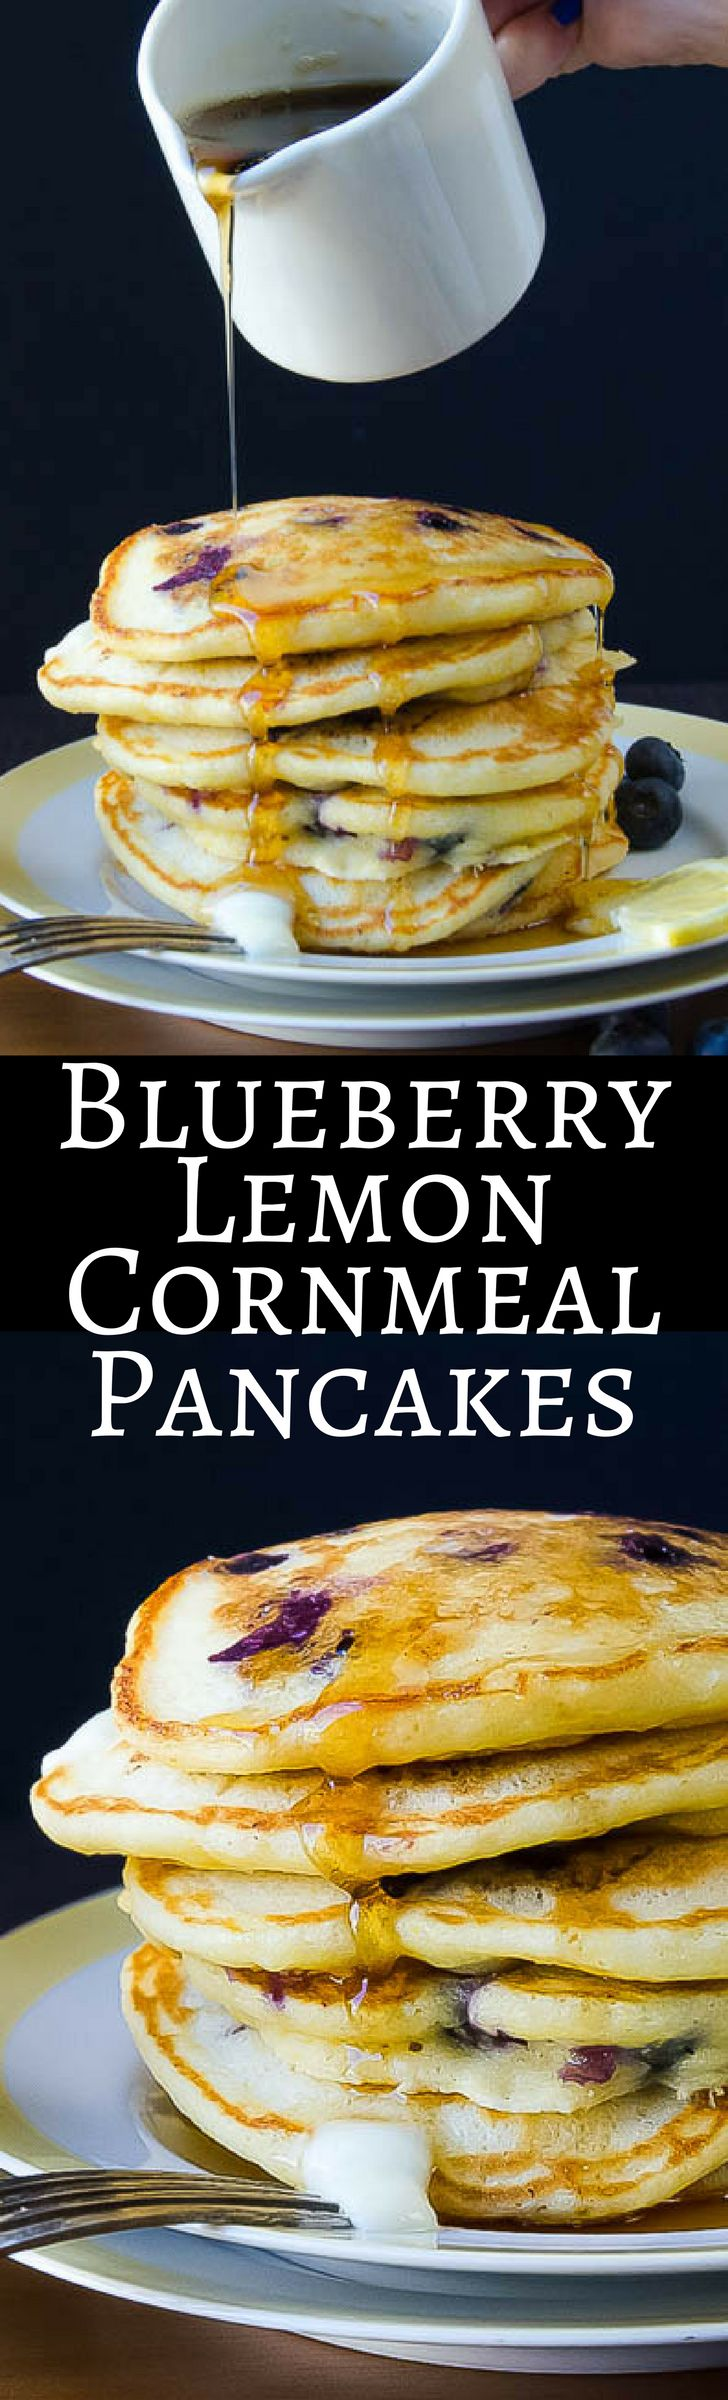 Blueberry Lemon Cornmeal Pancakes | Garlic & Zest